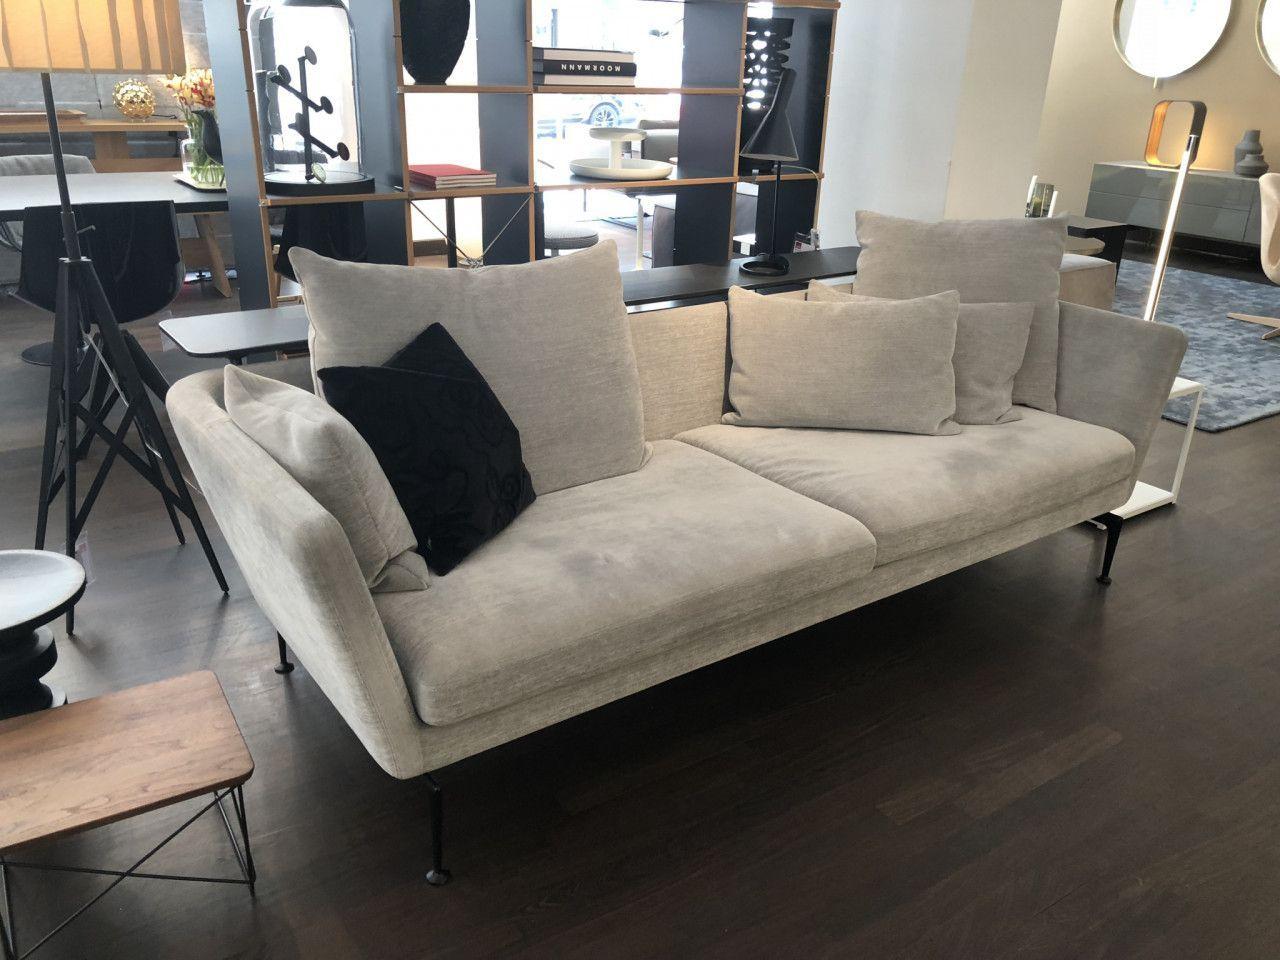 Sofa Suita Vitra Stoff Silbergrau Designermobel Einrichtung